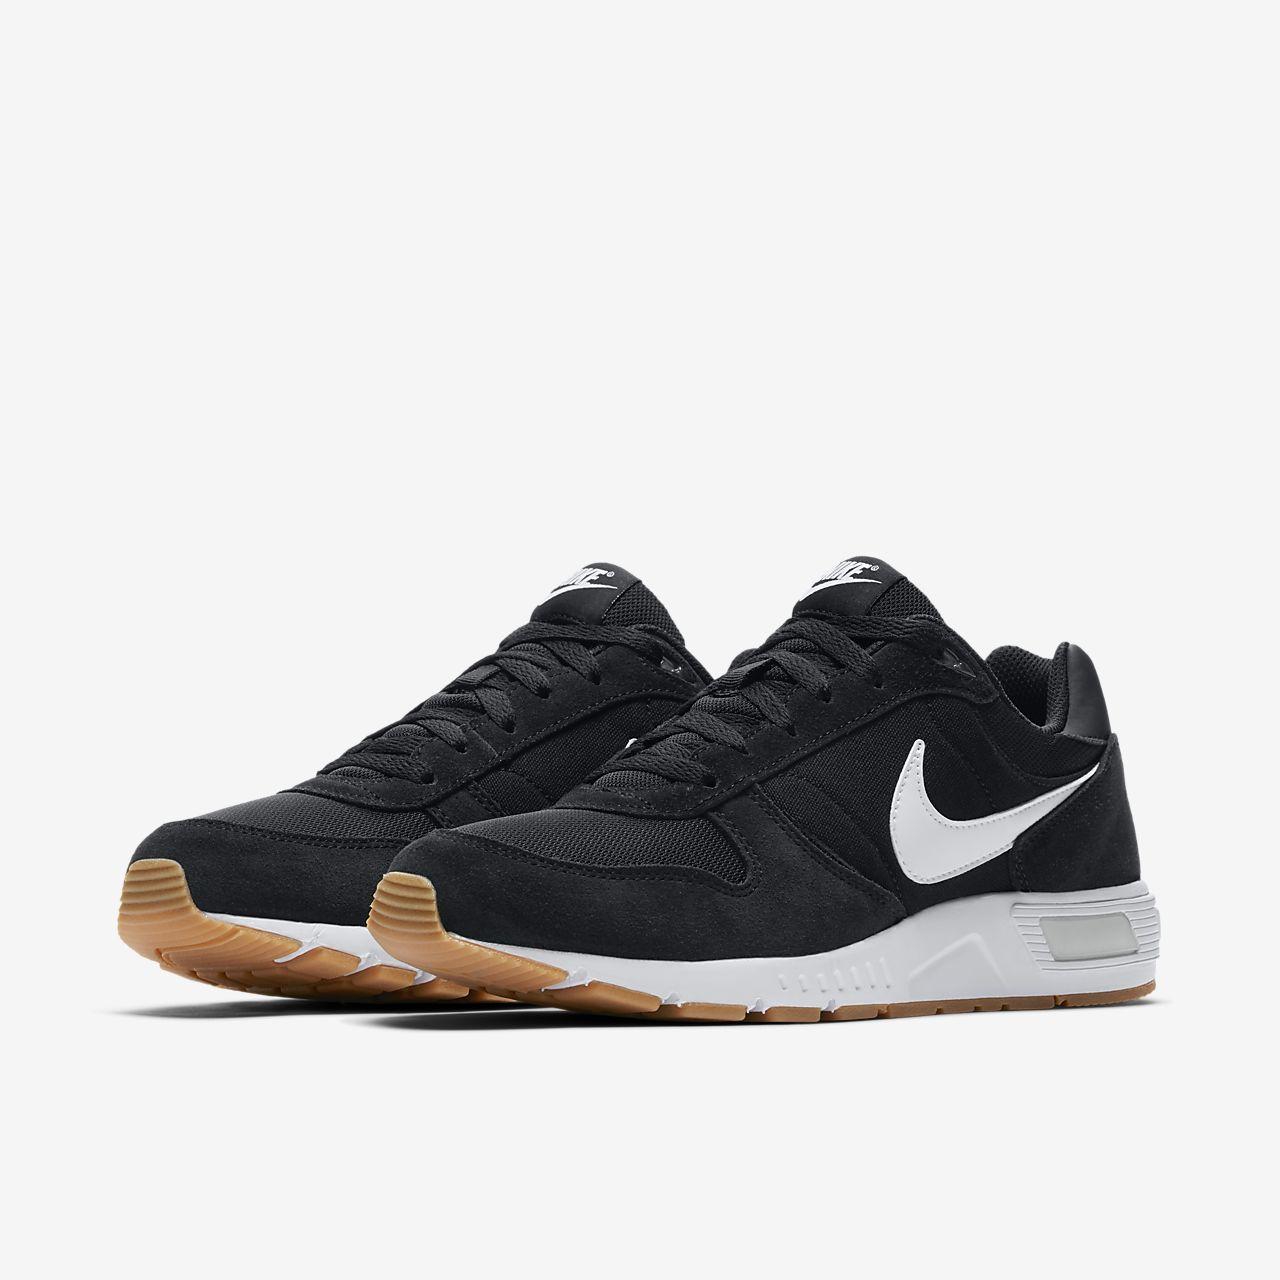 346e2bc4a8c56 Low Resolution Nike Nightgazer Men s Shoe Nike Nightgazer Men s Shoe